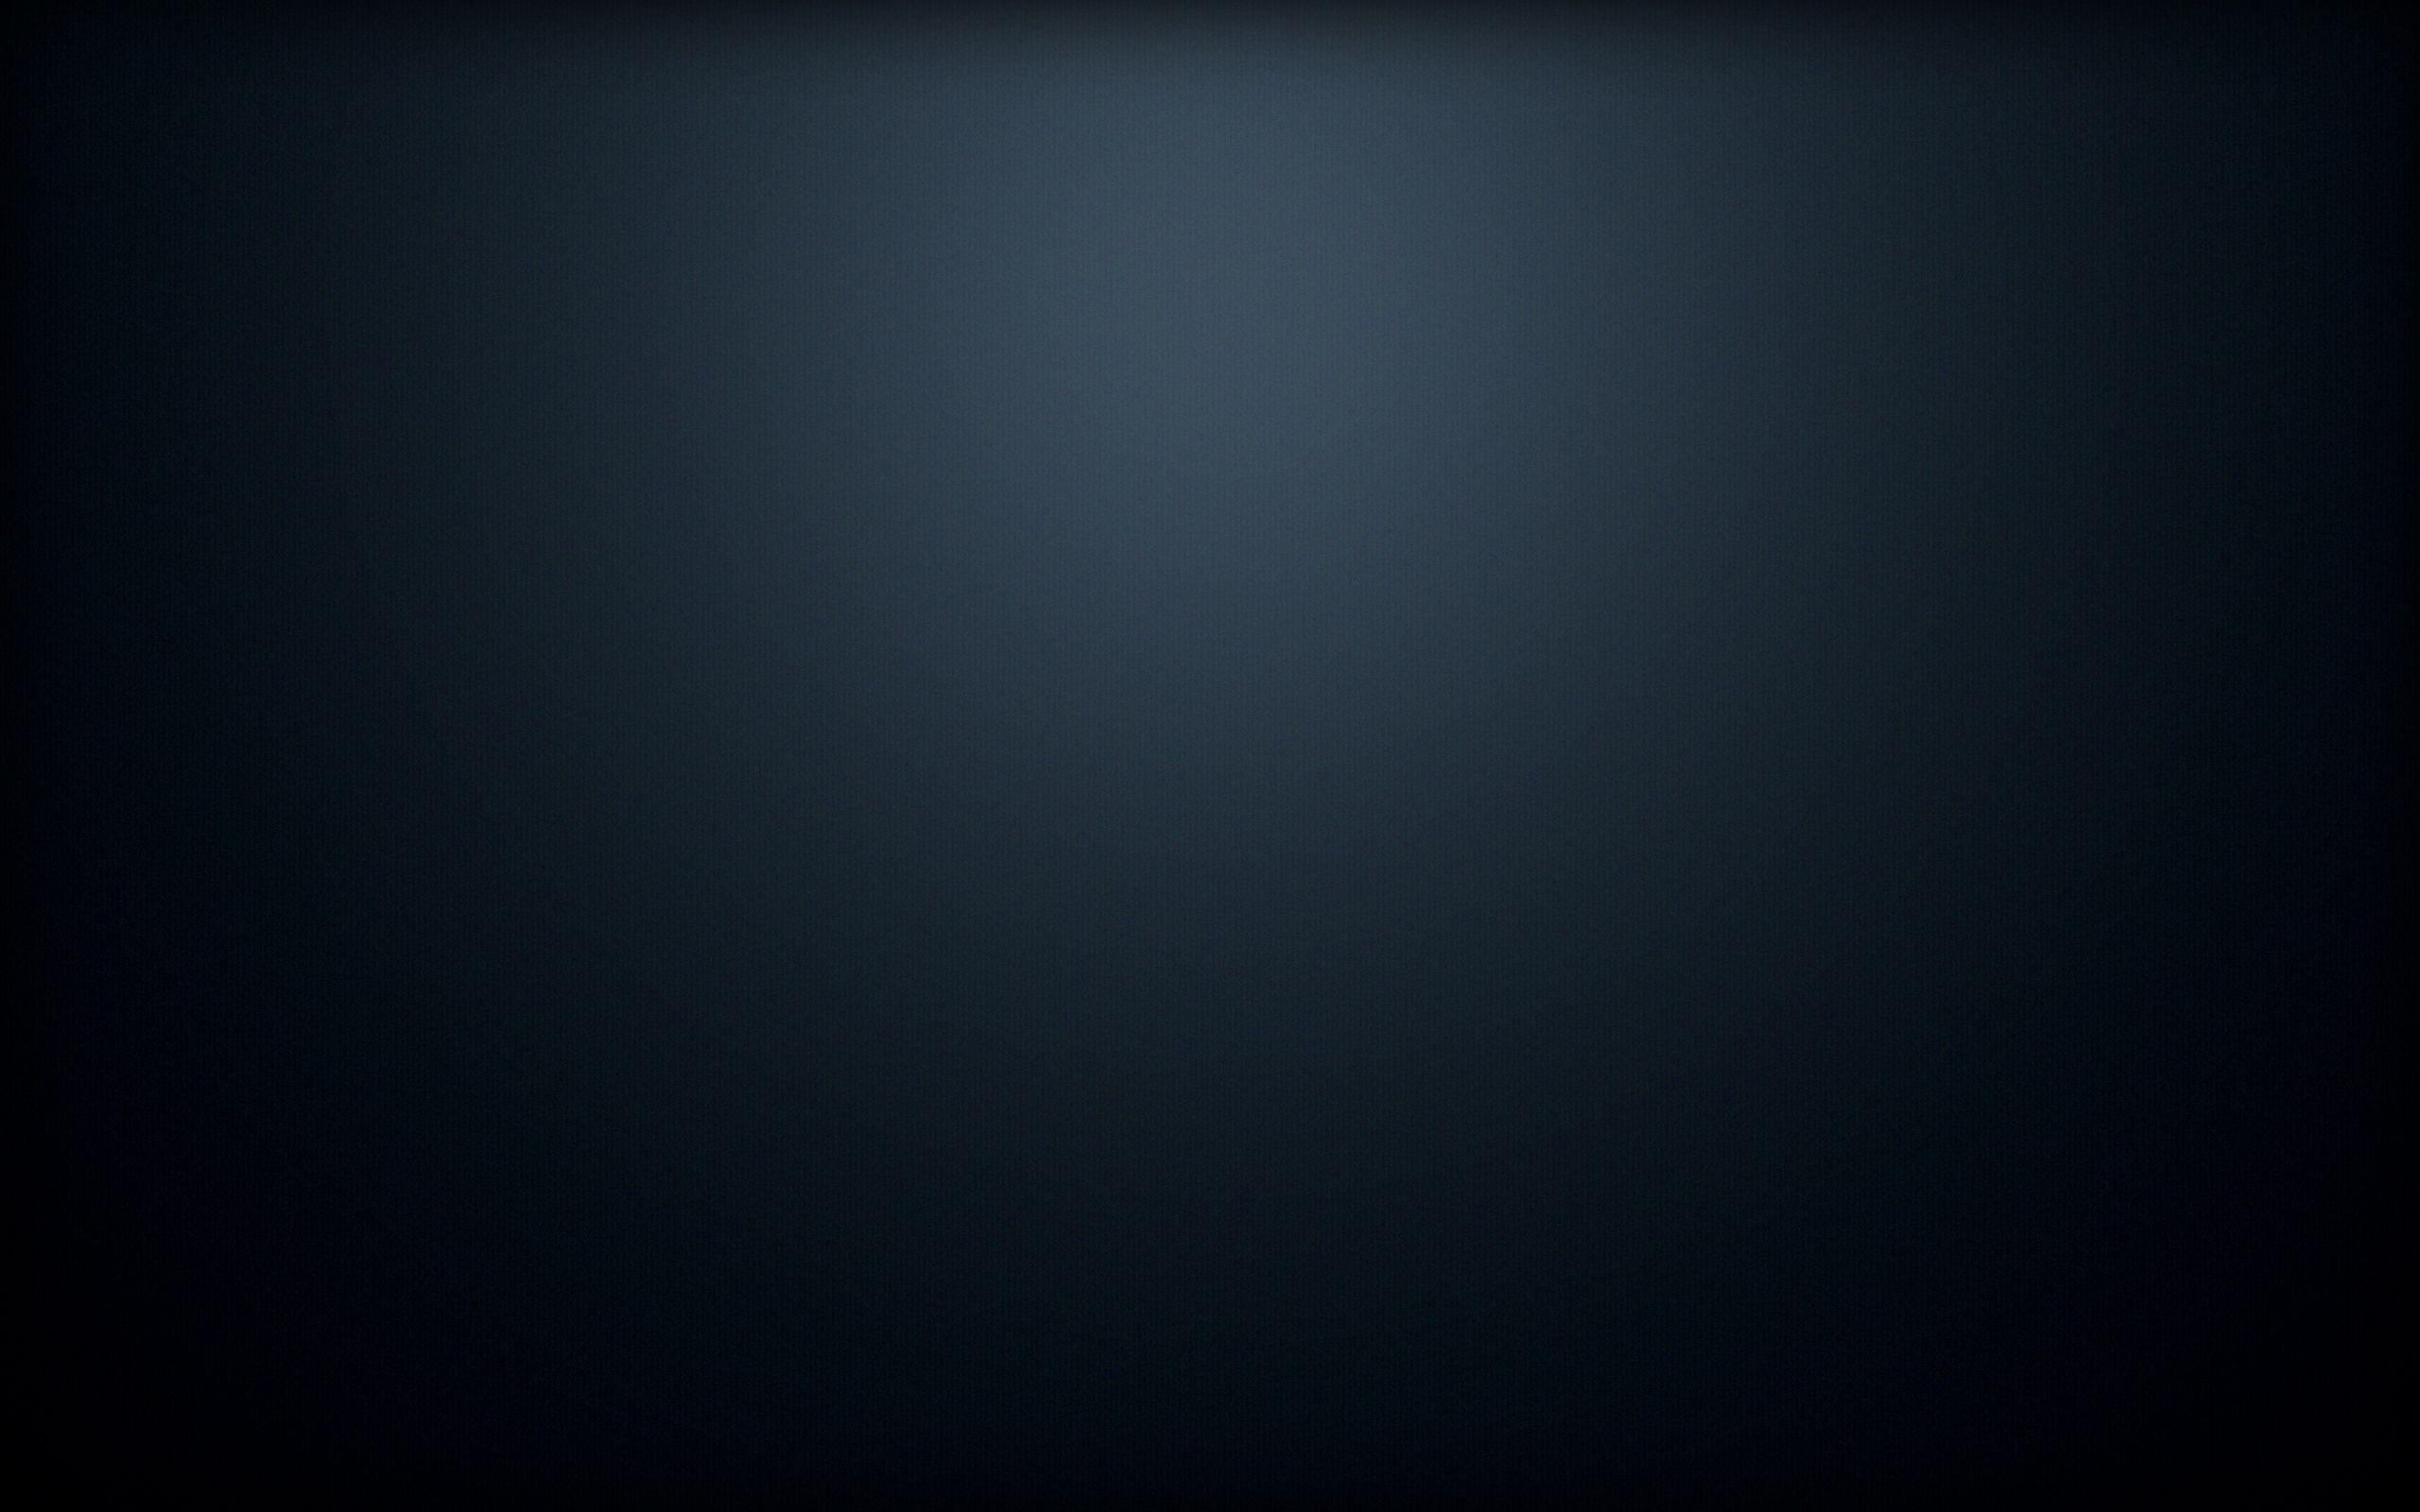 Download Black Texture Wallpaper x Full HD Wallpapers